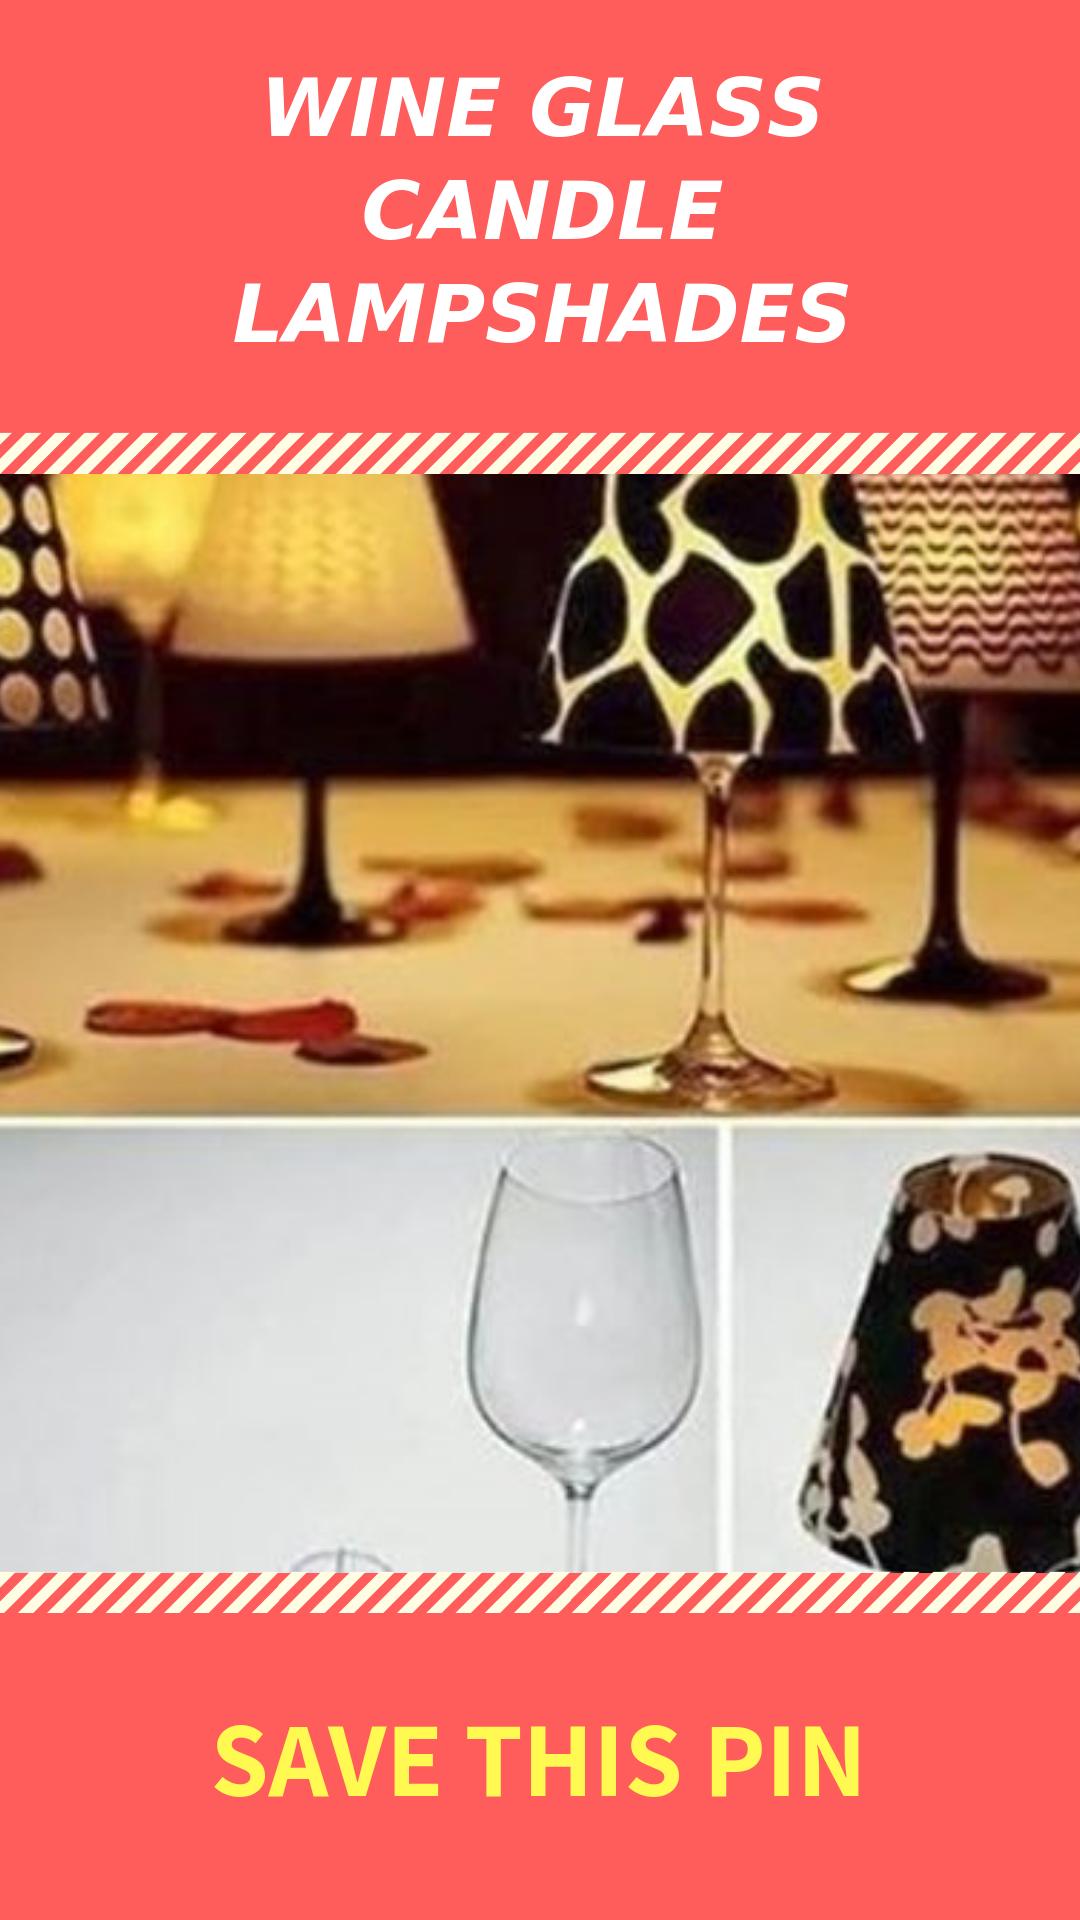 Wonderful Diy Wine Glass Candle Lampshades Wine Glass Lampshades Candles